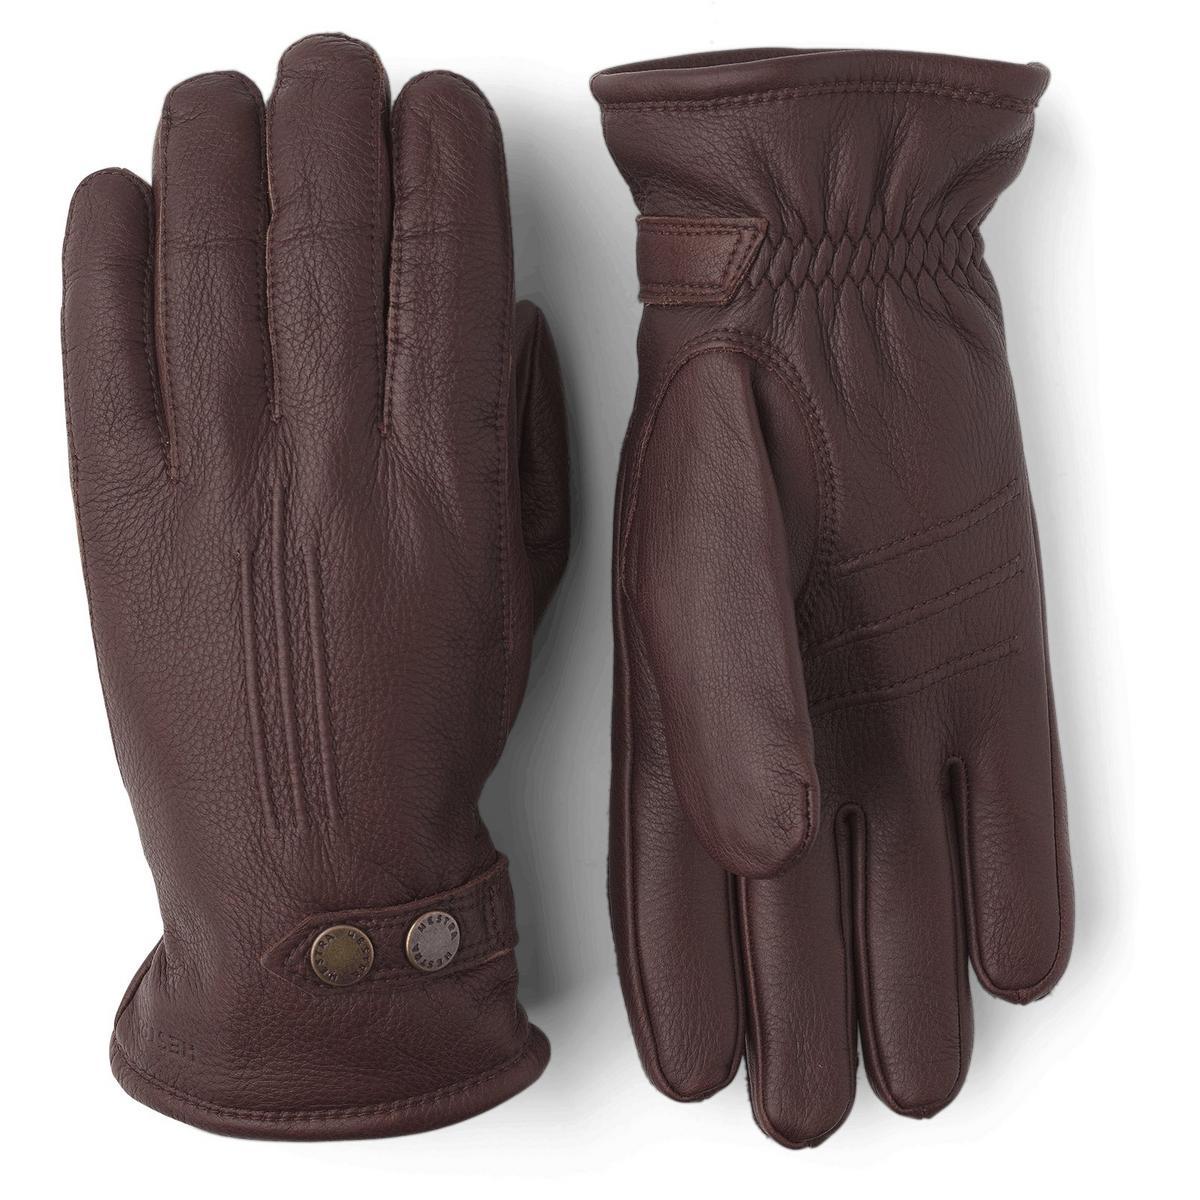 Hestra Men's Tallberg Glove - Espresso